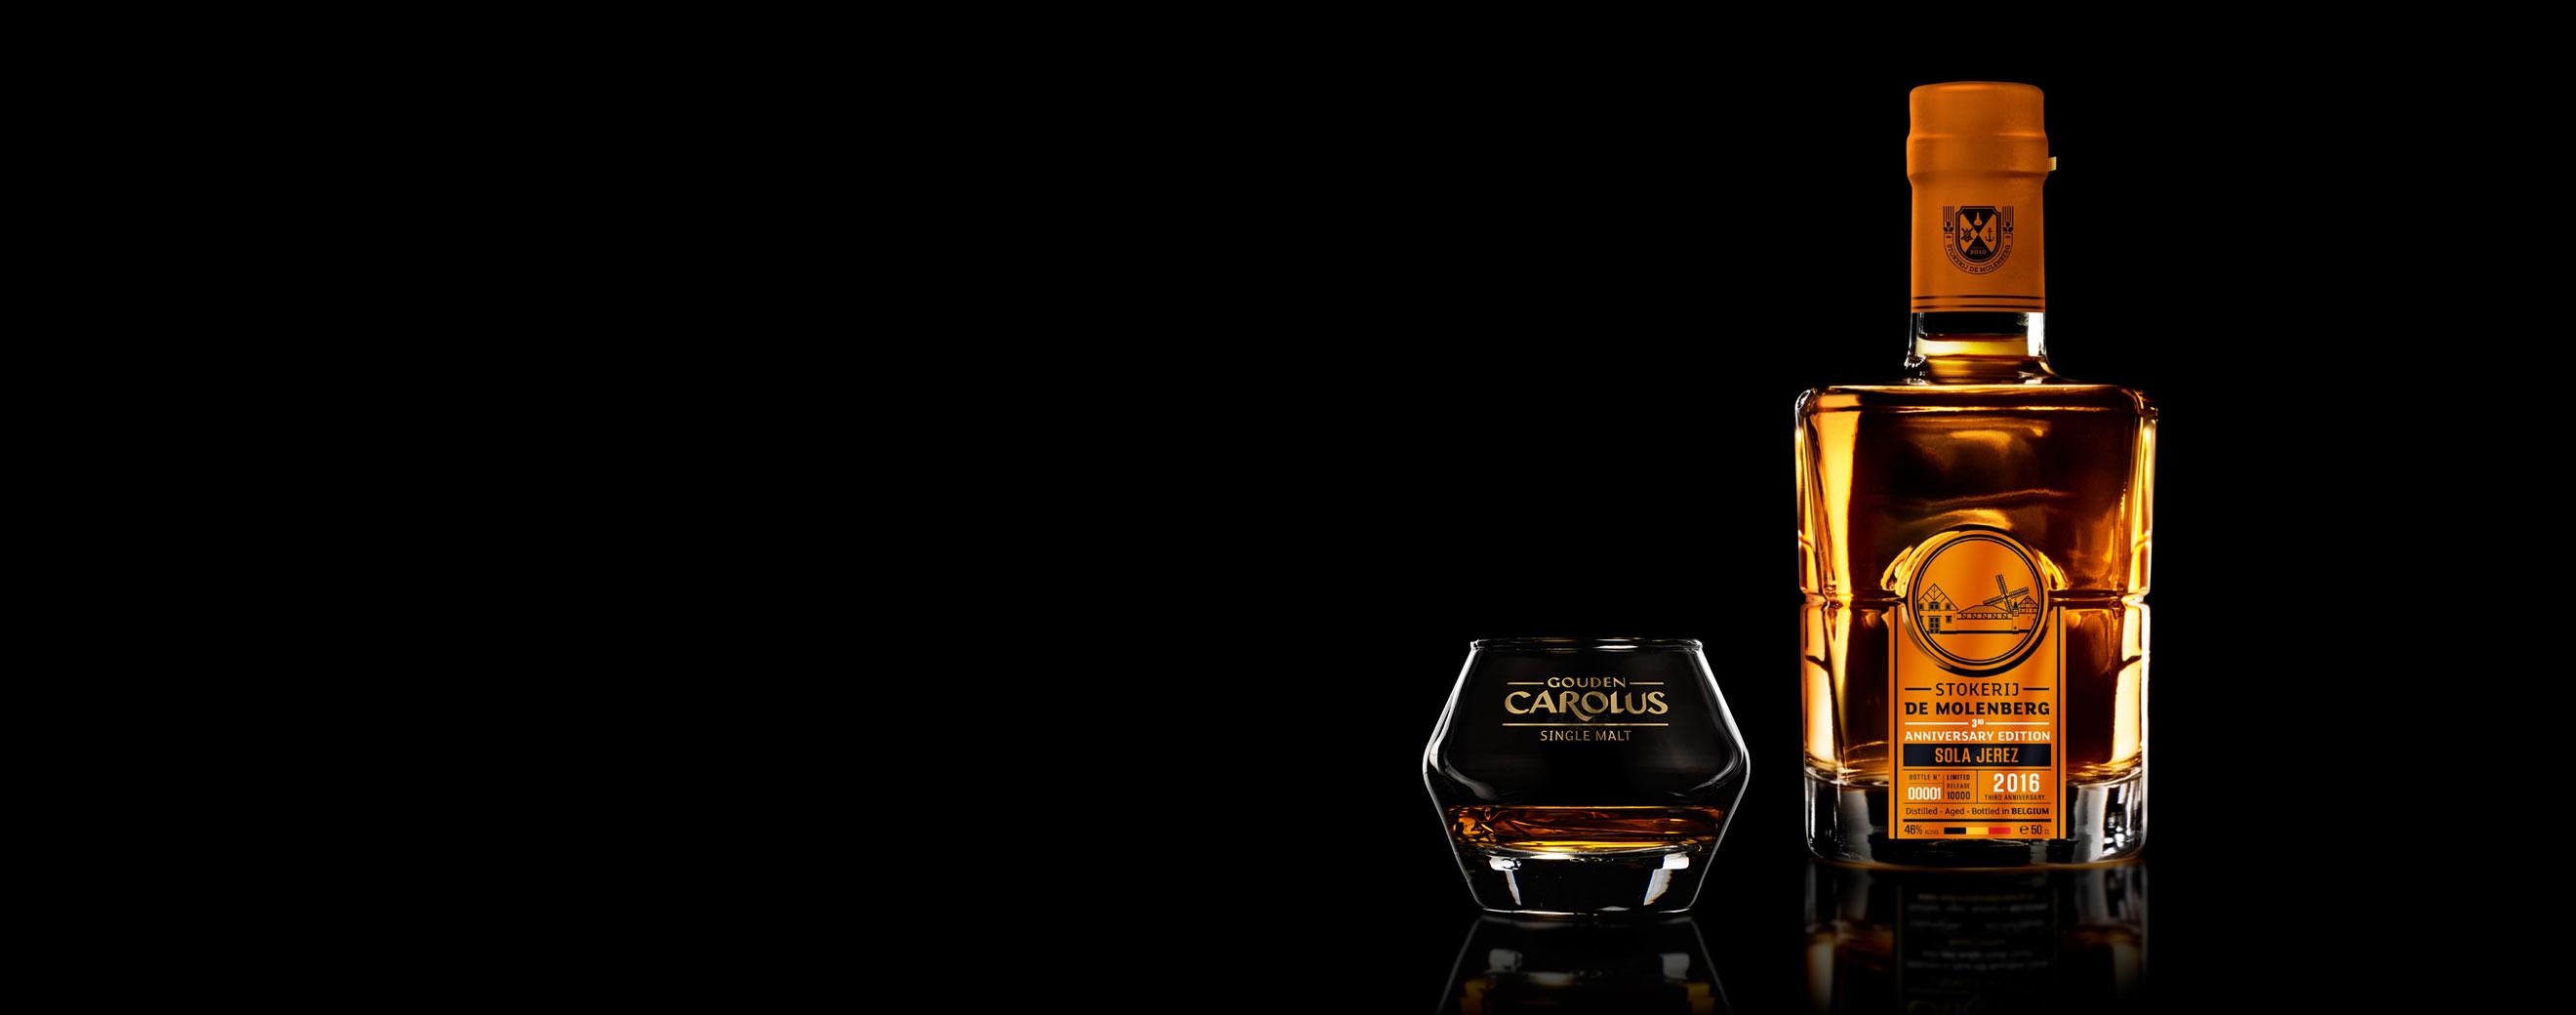 Sola Jerez 2016 Whisky Stokerij De Molenberg